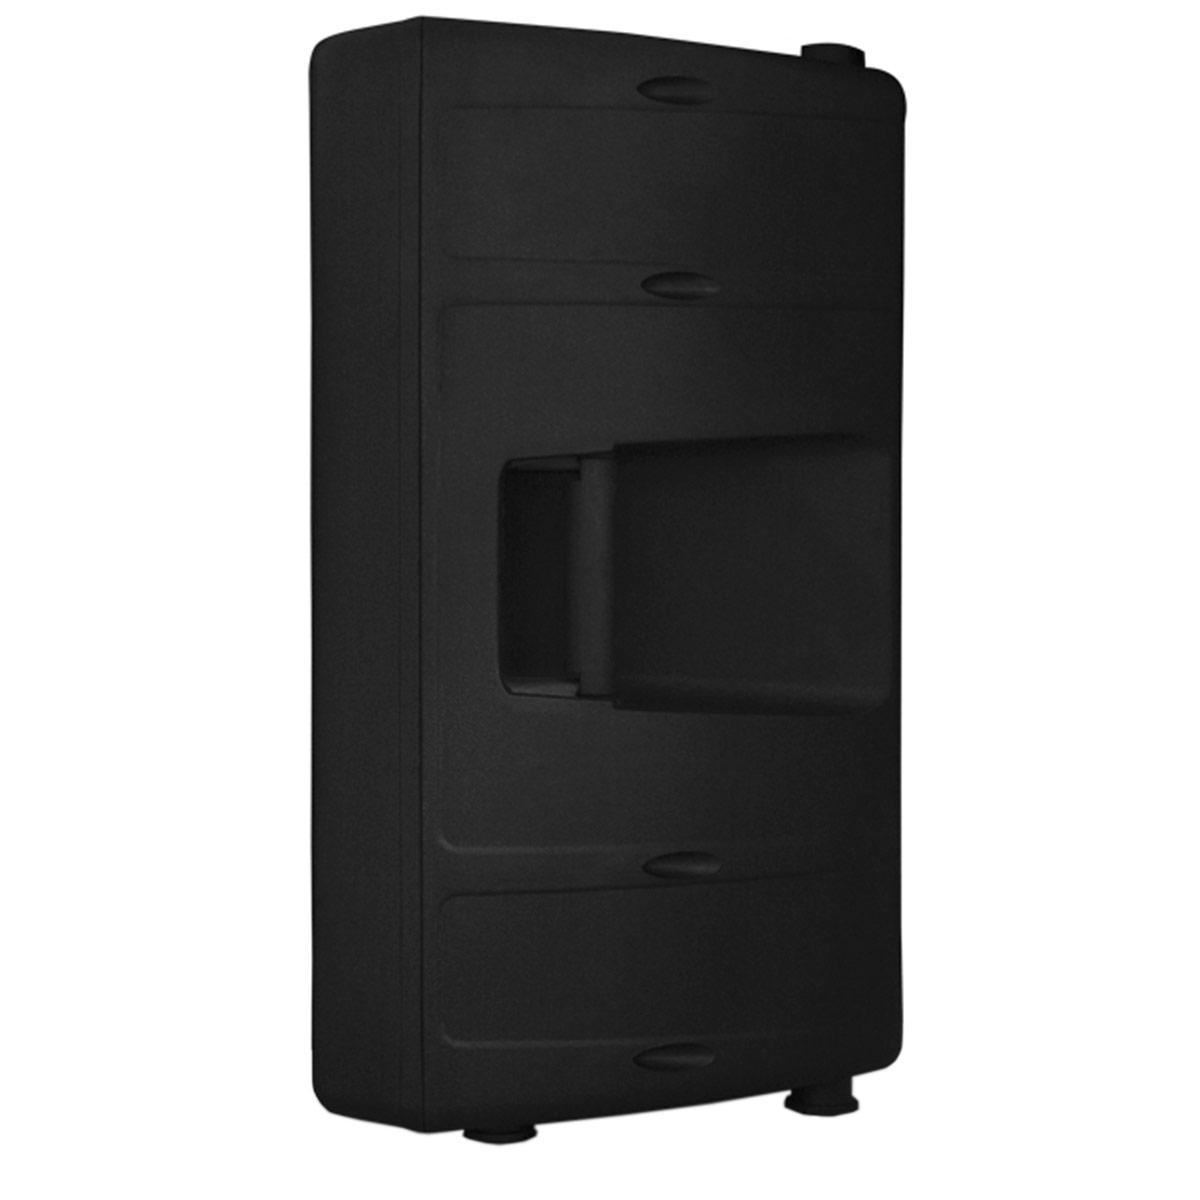 EVO350AUSB - Caixa Ativa 350W c/ USB EVO 350 A USB - Novik Neo